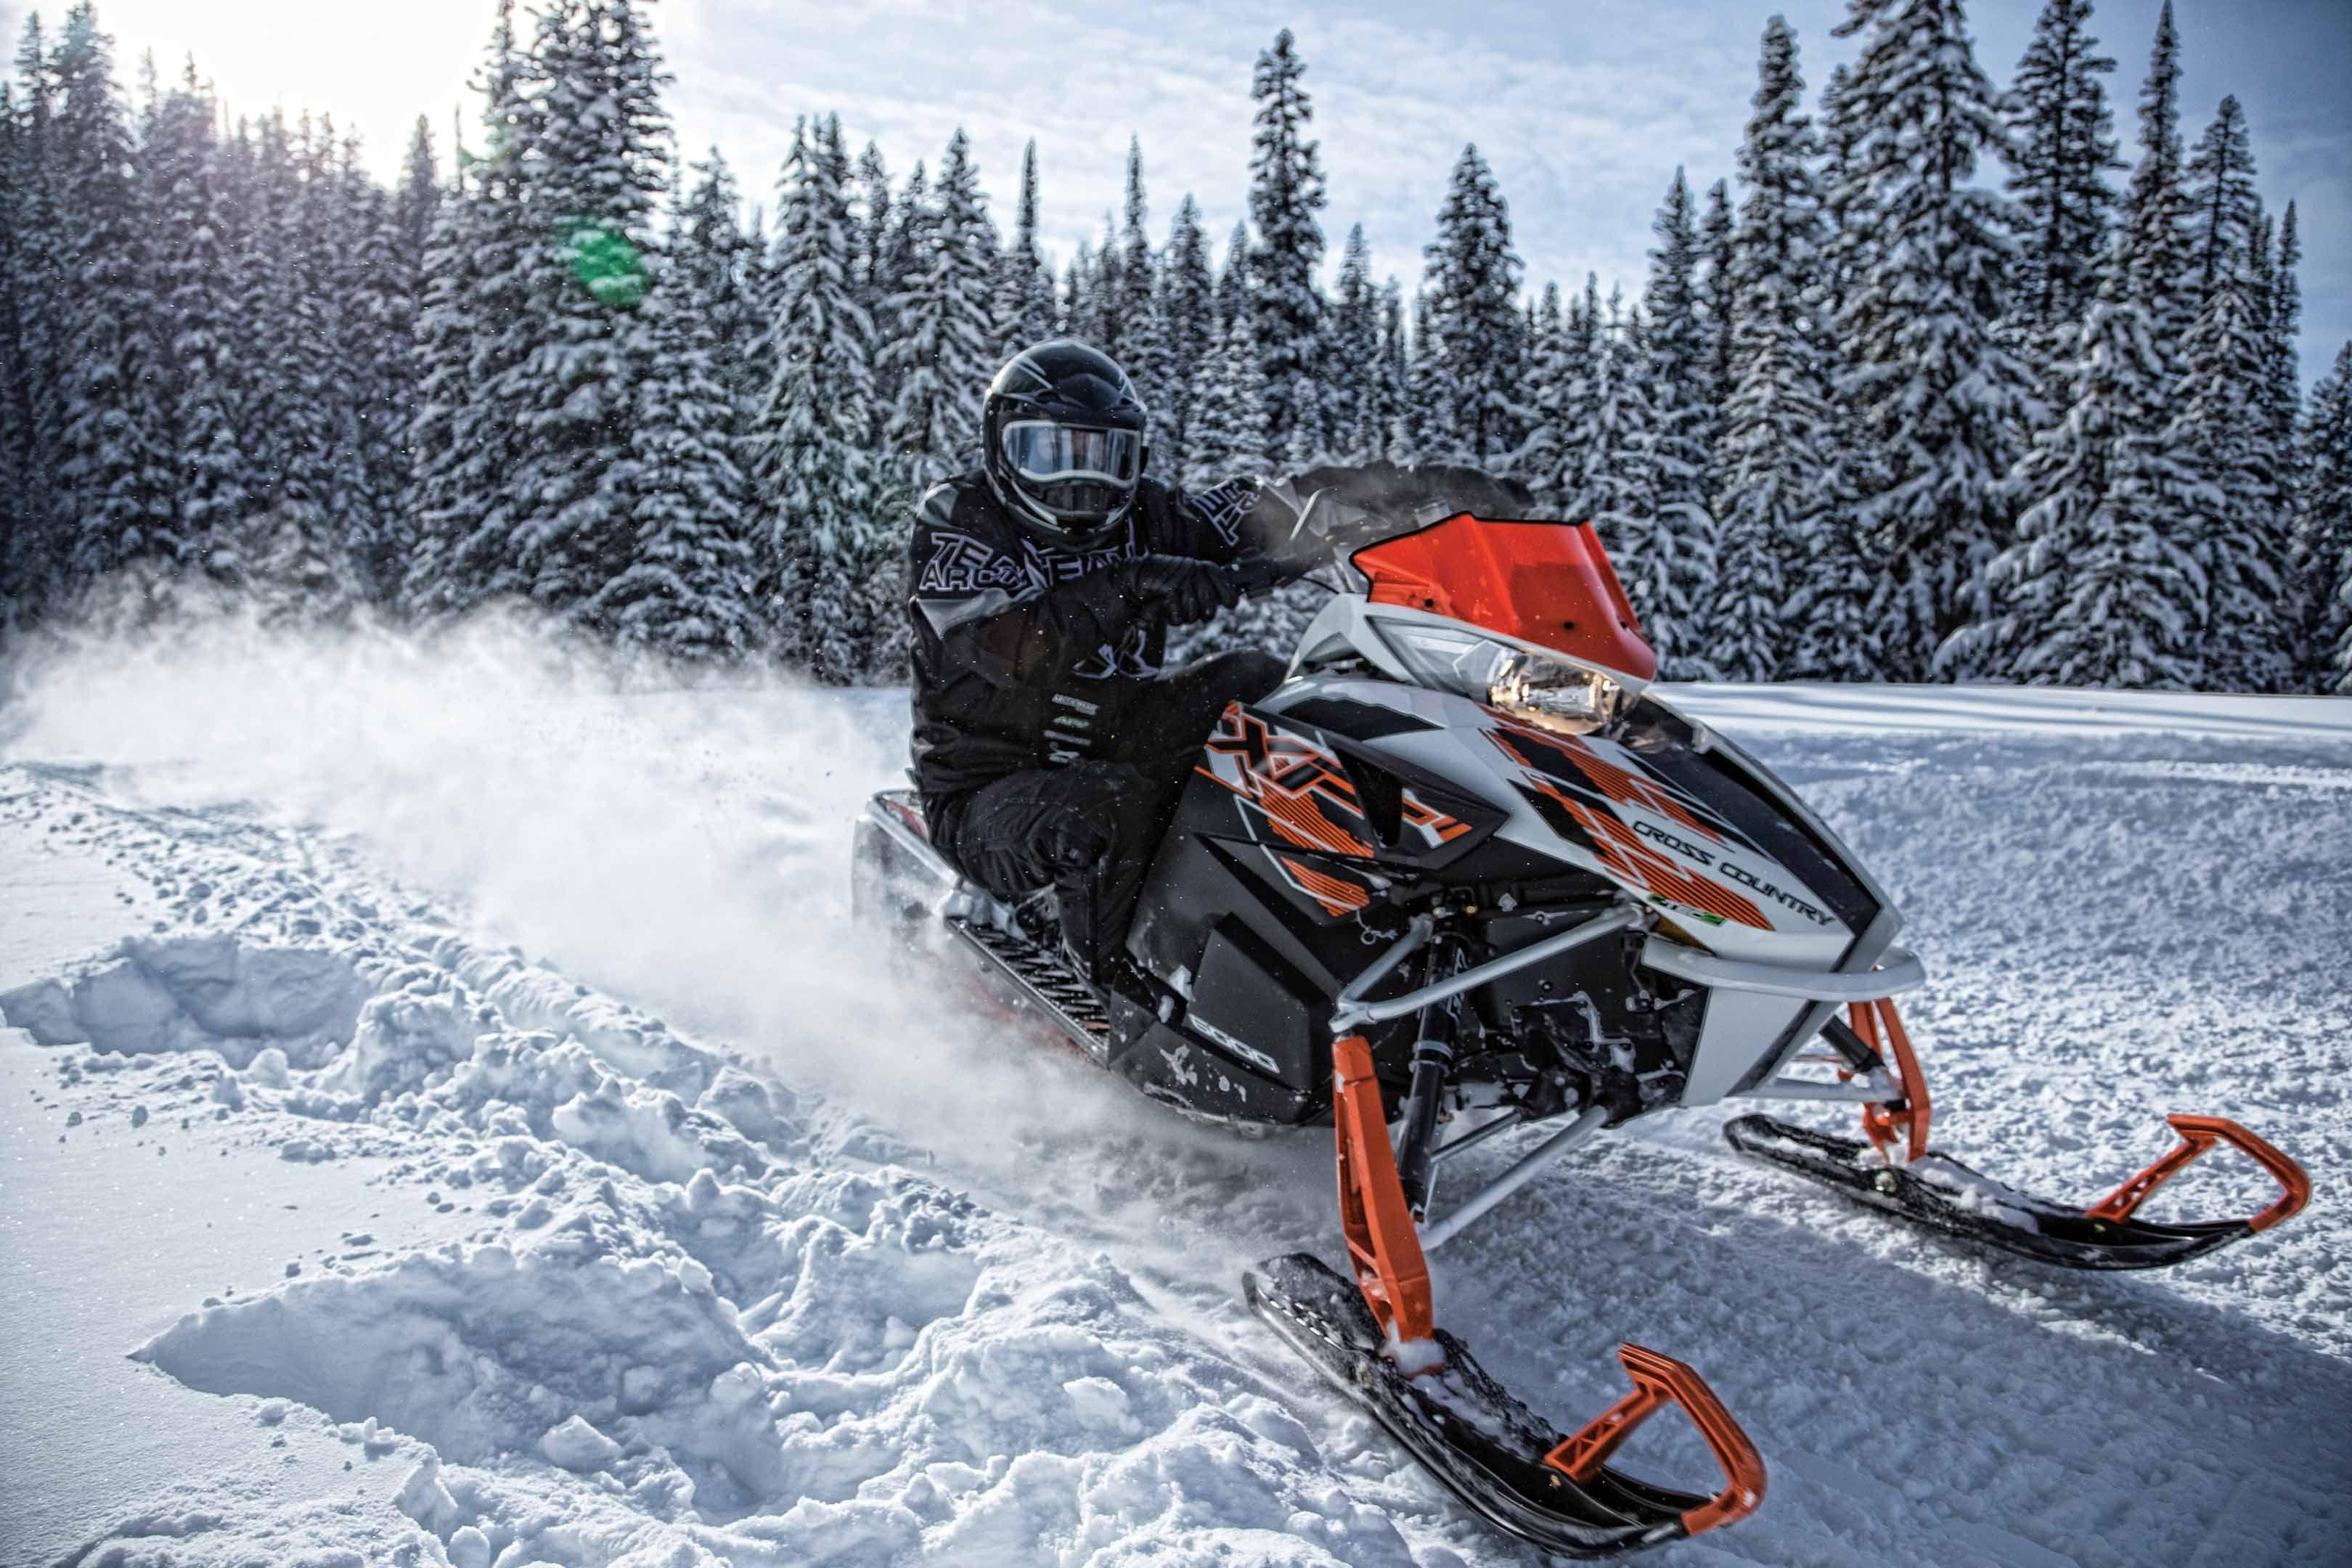 2020 Arctic Cat Snowmobiles Prices